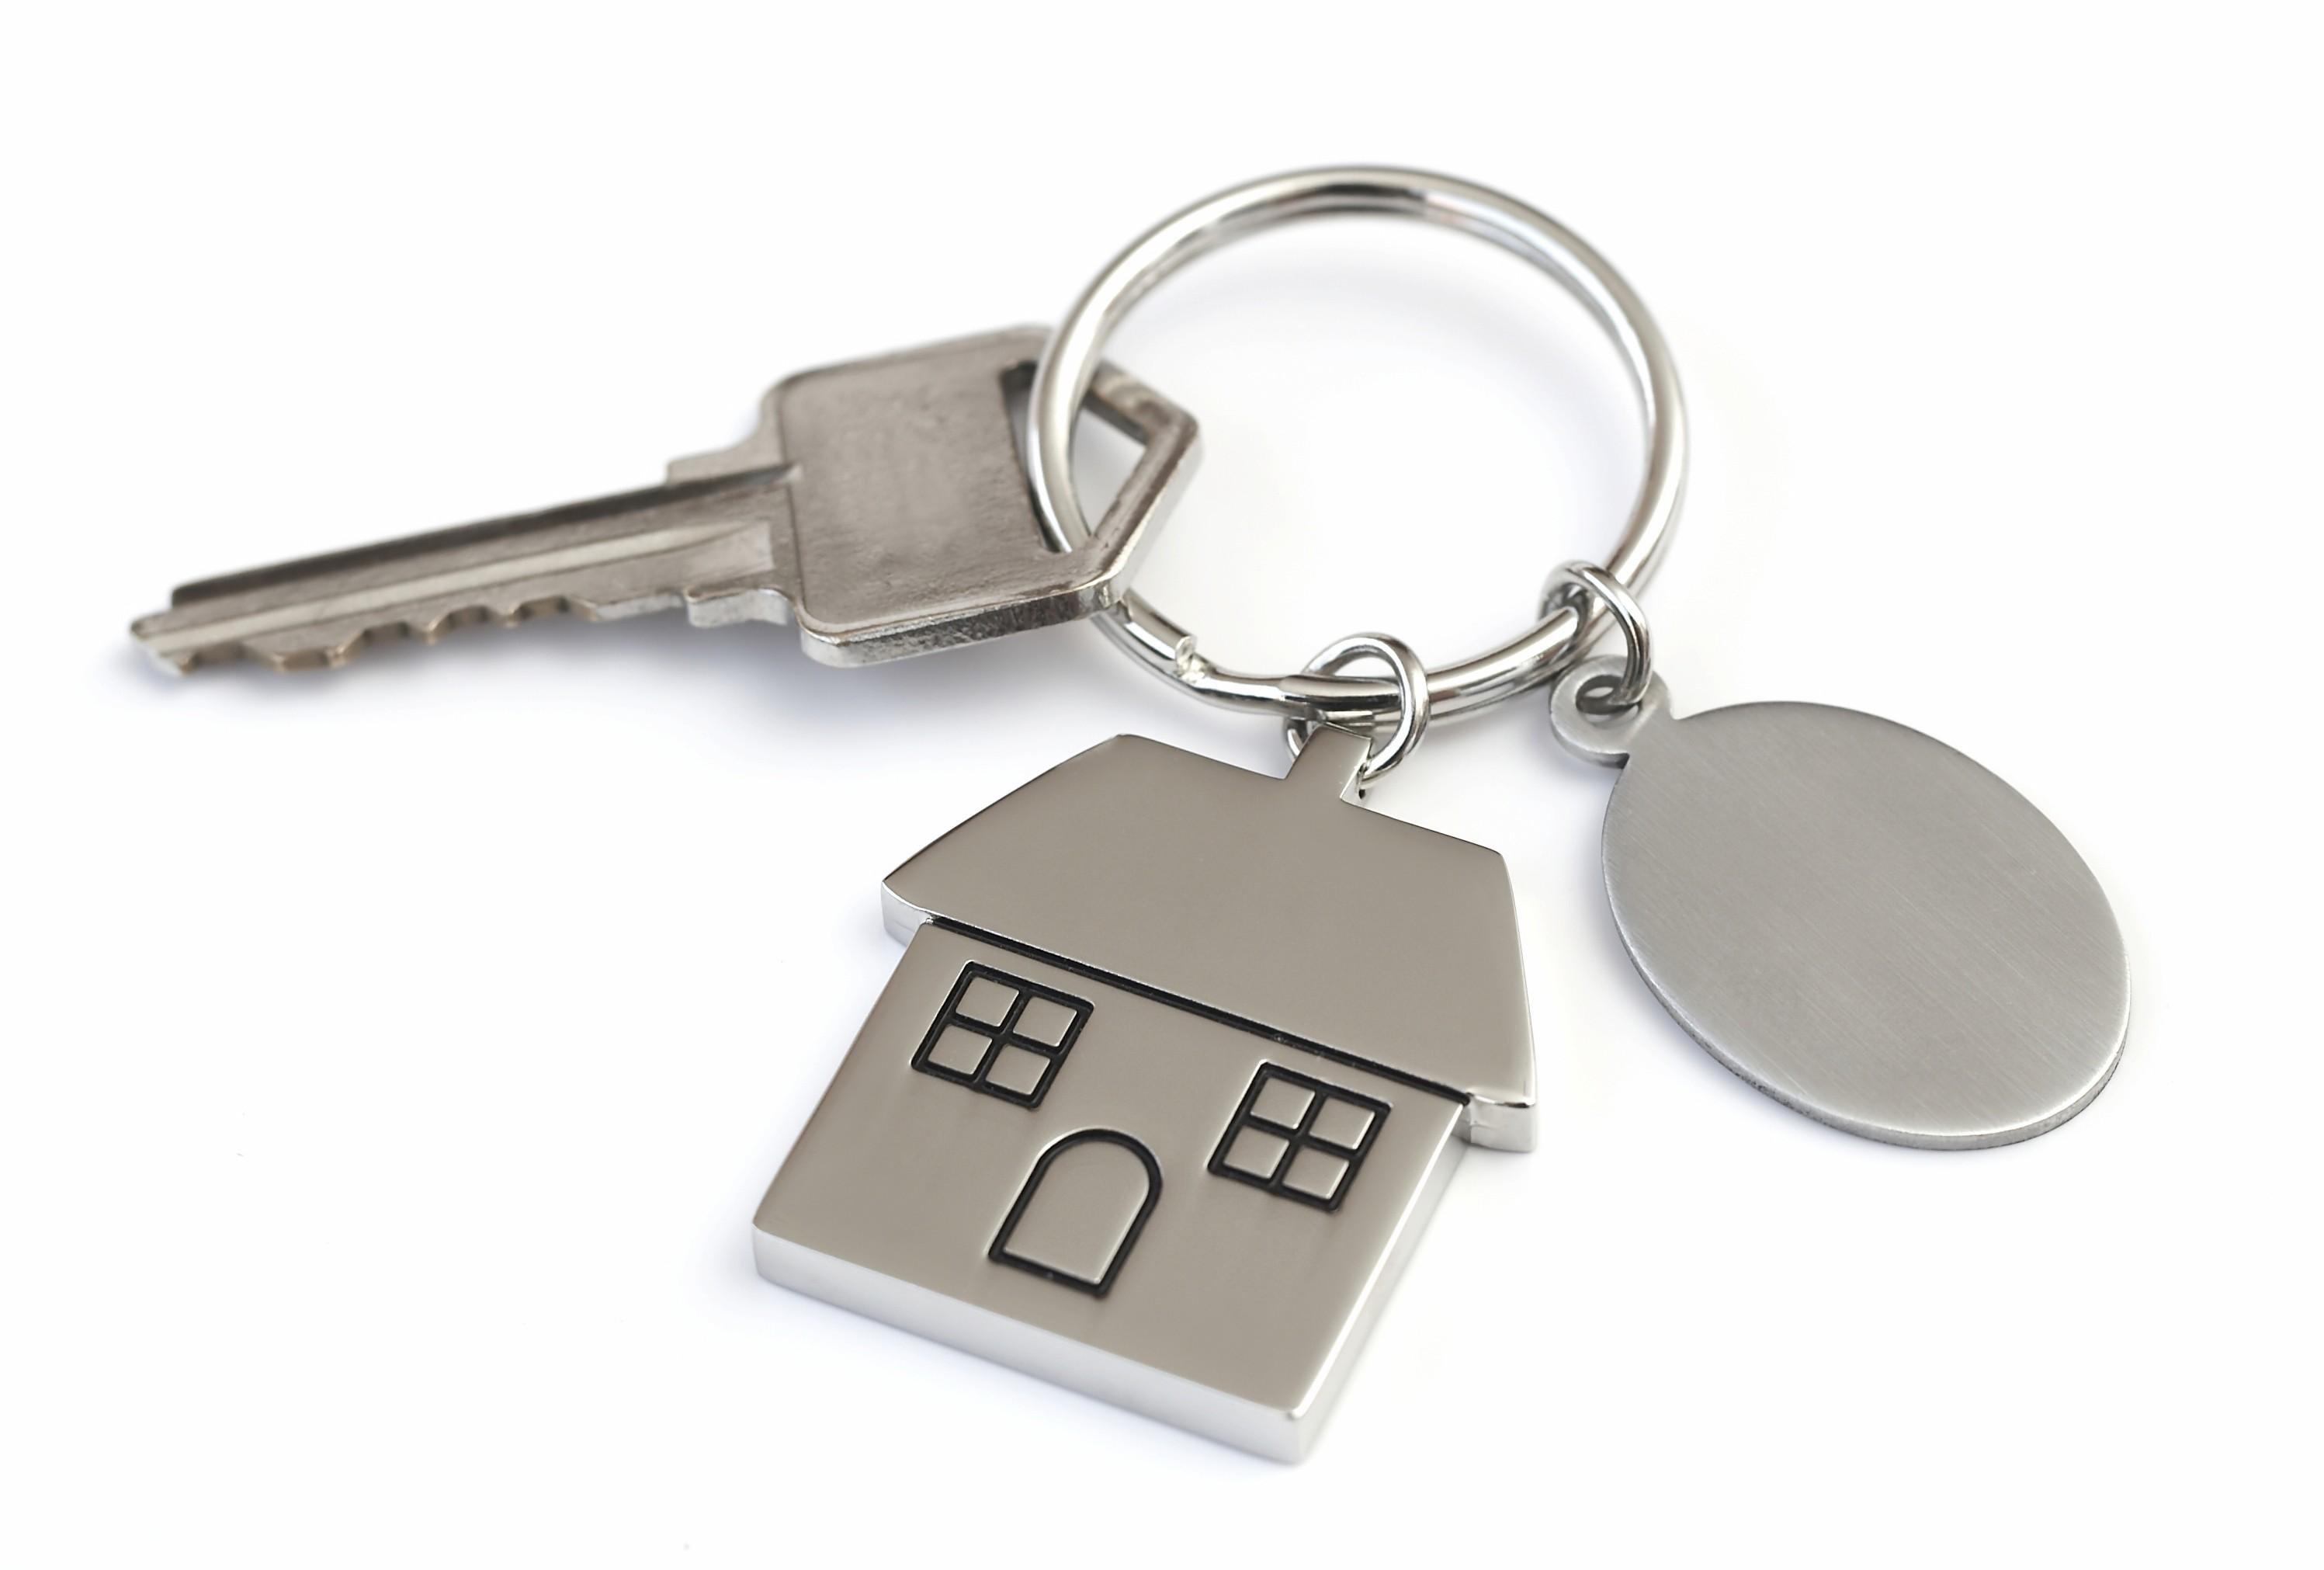 new-home-keys-new-home-keys